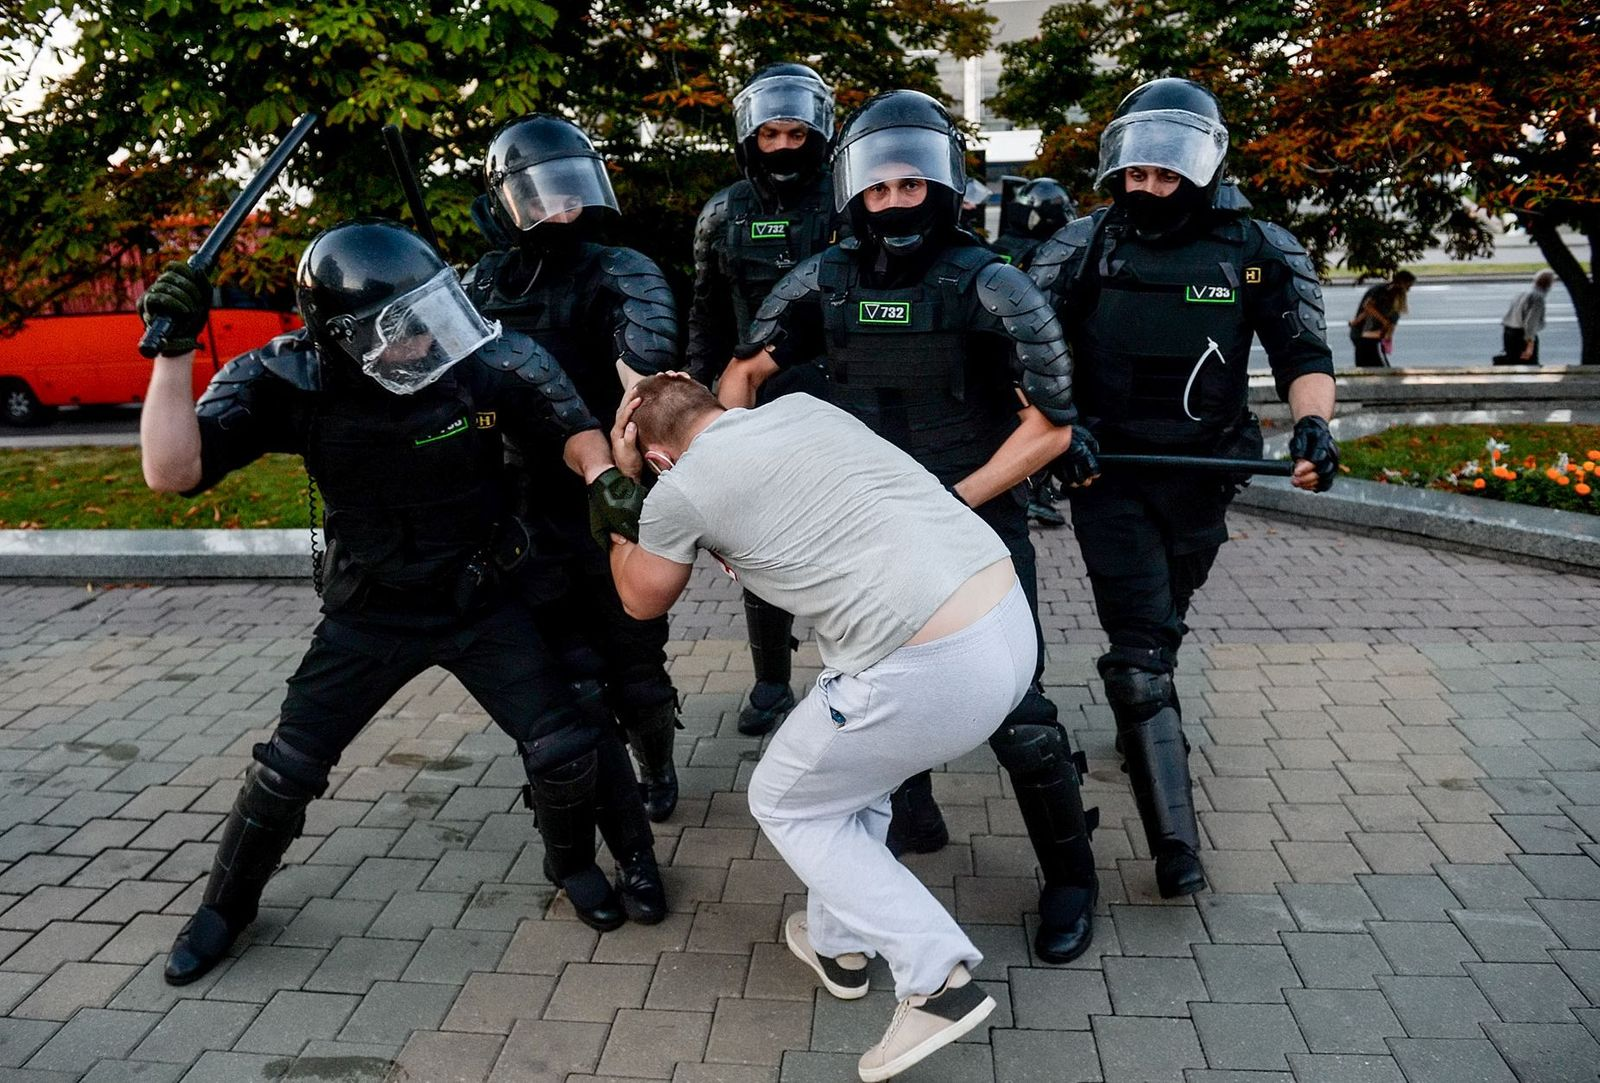 Presidential elections reactions in Belarus, Minsk - 10 Aug 2020